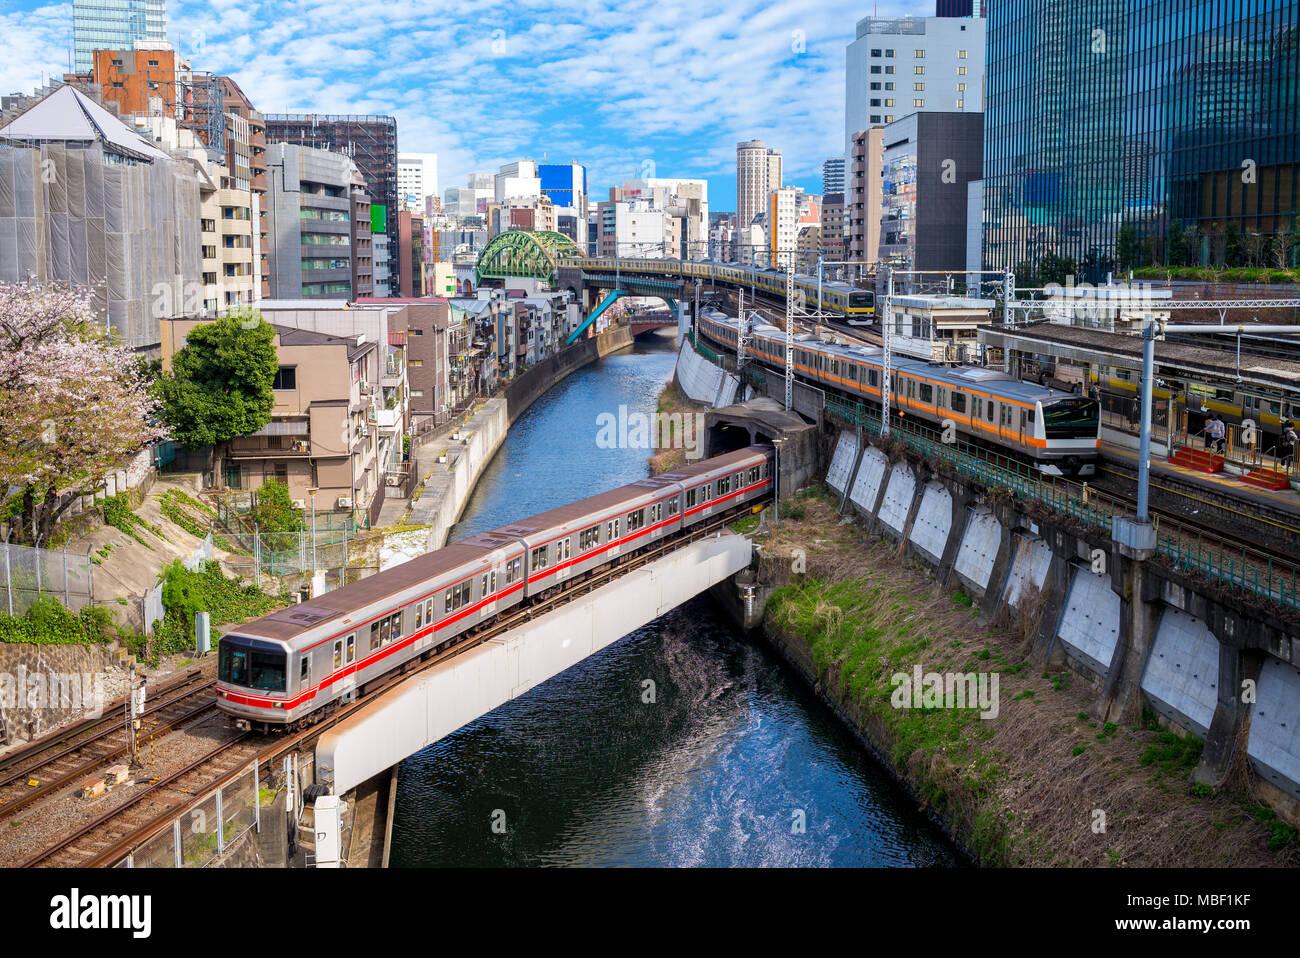 metro system of tokyo city, japan - Stock Image